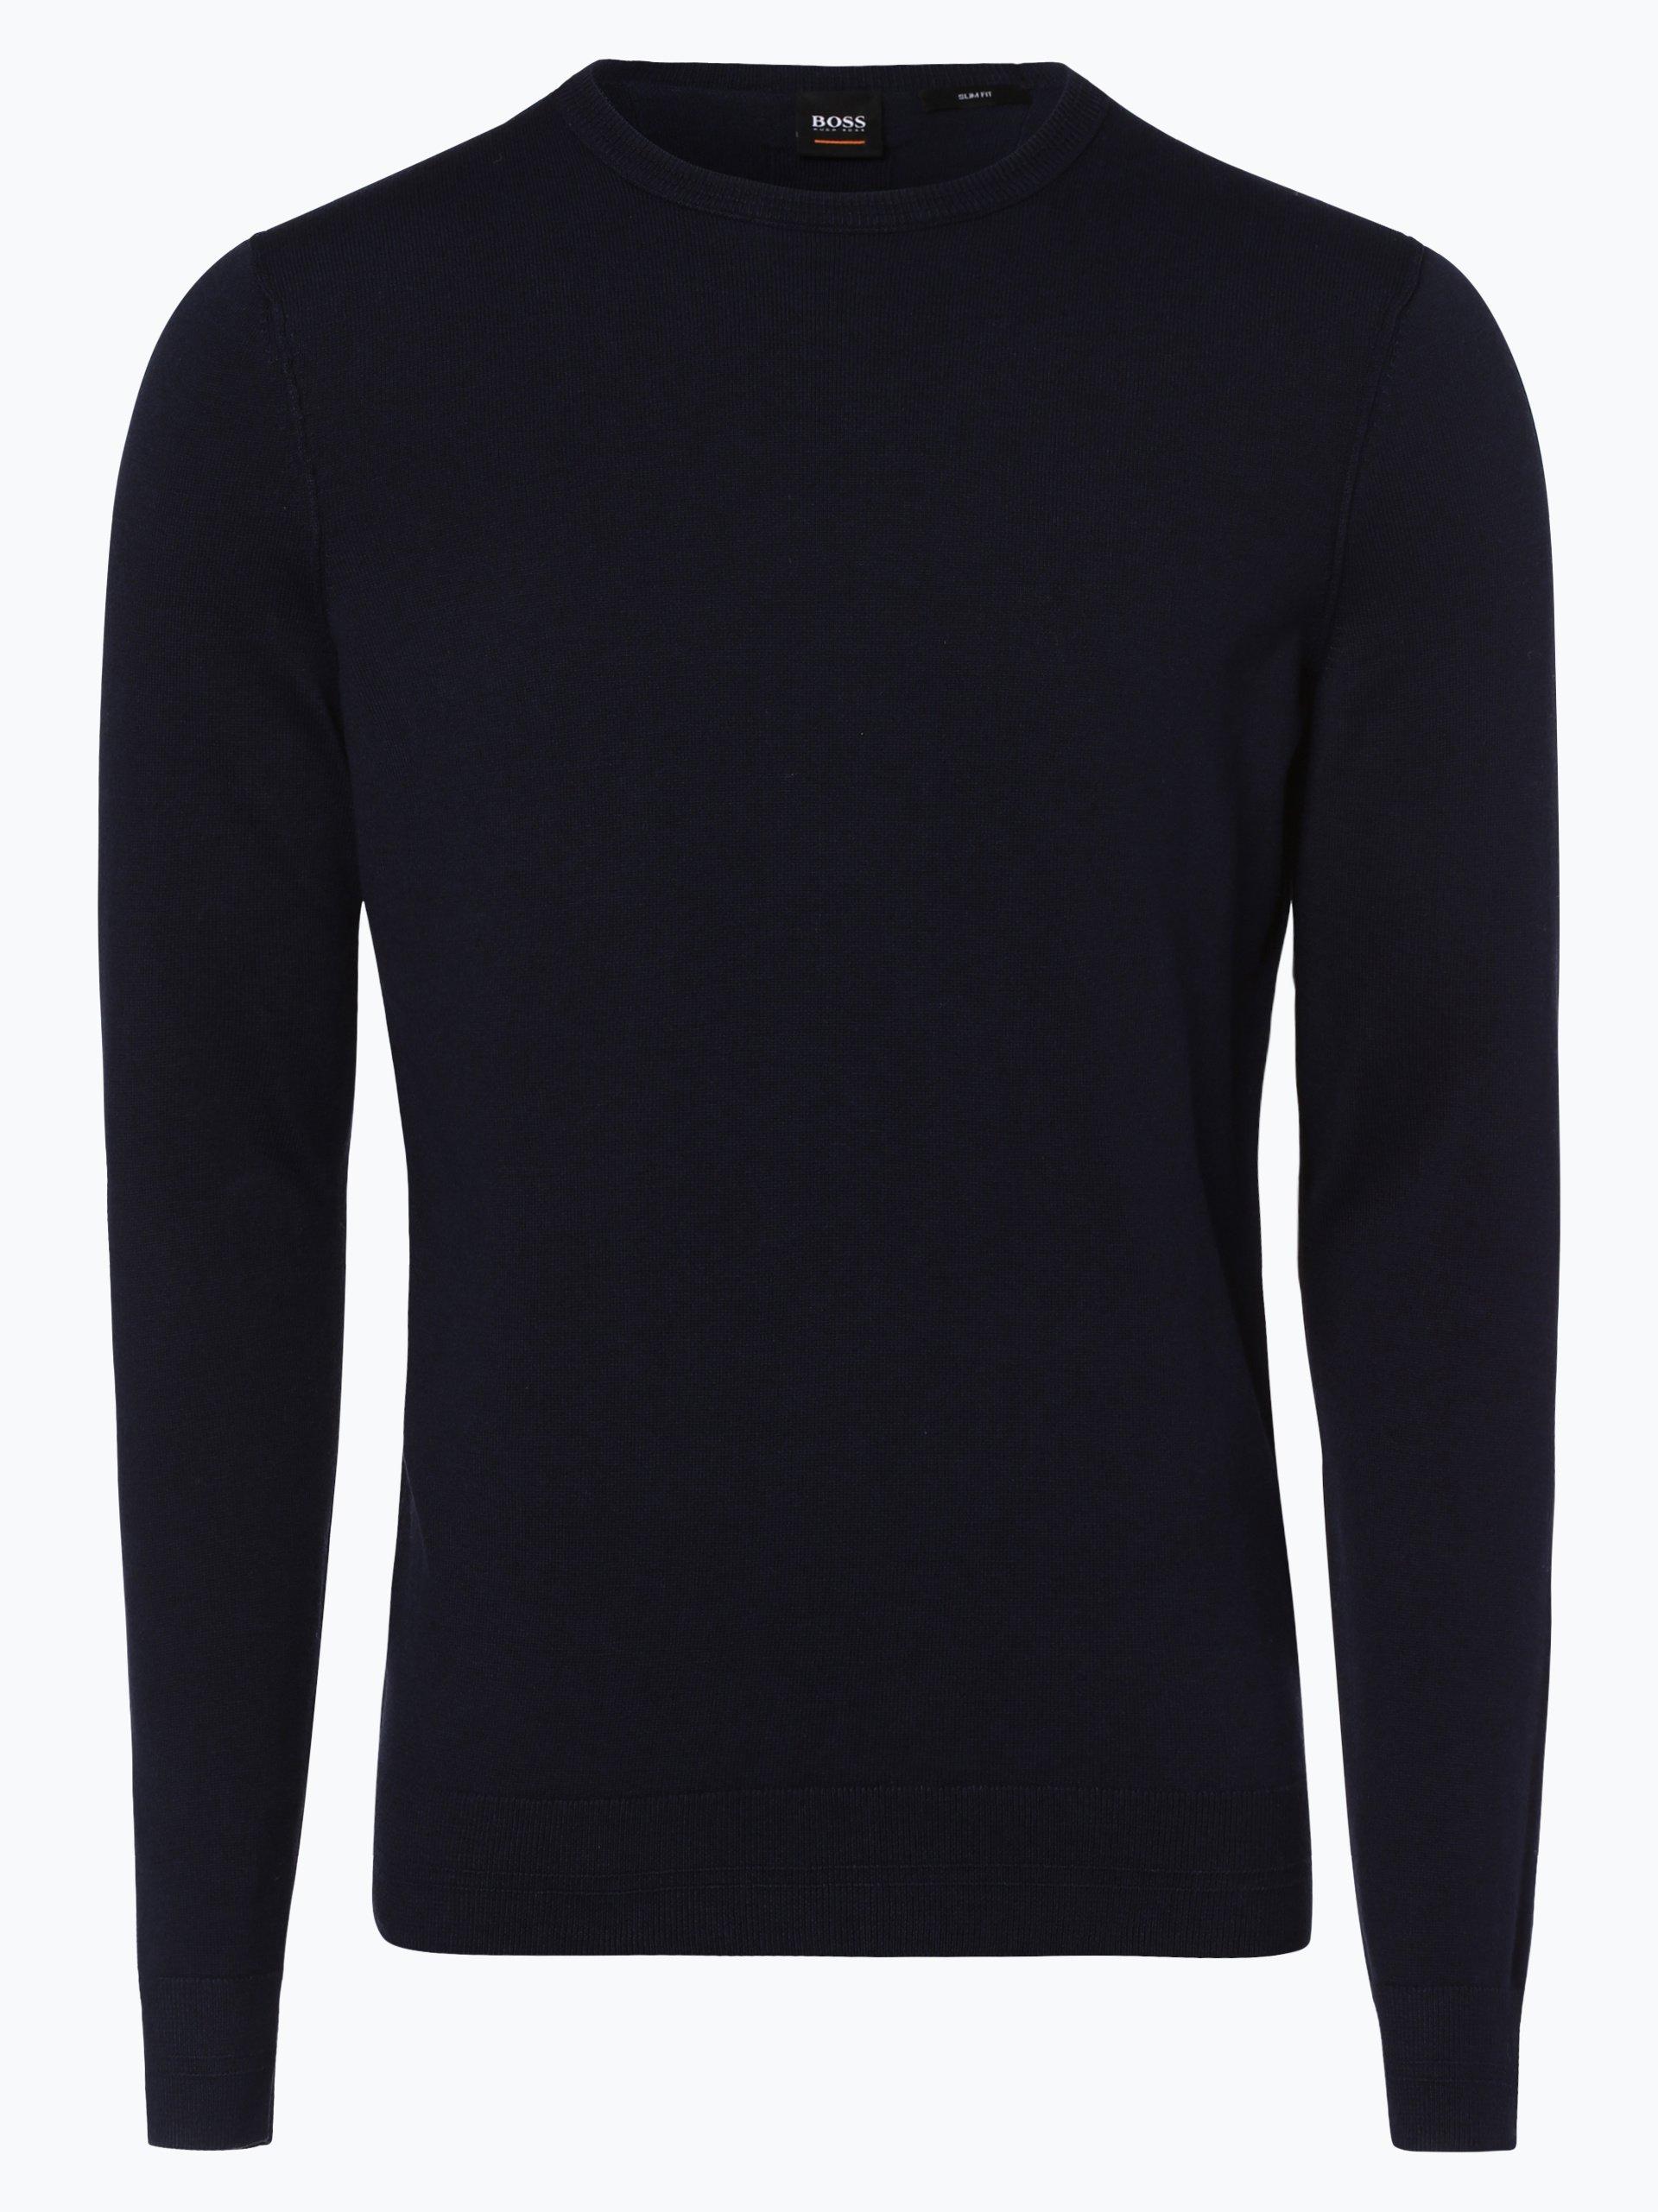 boss casual herren pullover mit cashmere anteil kwasiros. Black Bedroom Furniture Sets. Home Design Ideas